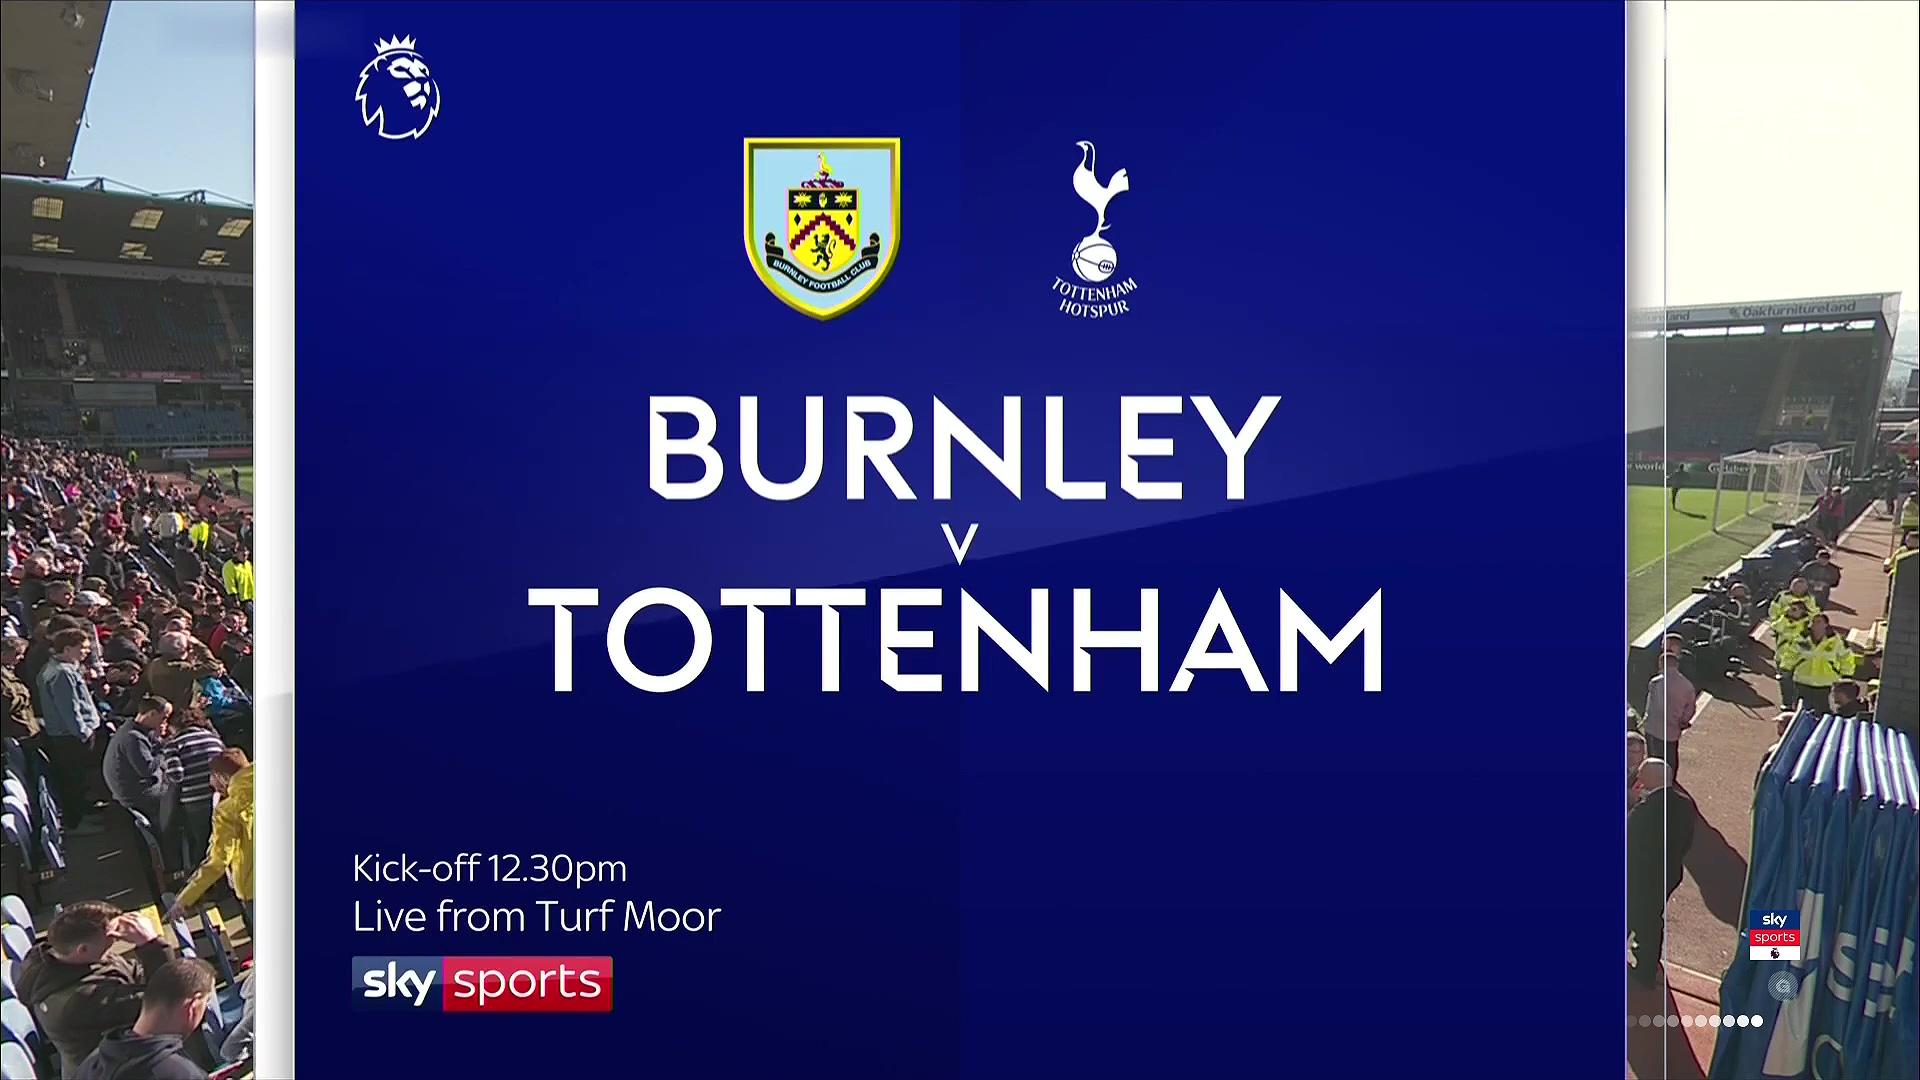 Xem lại: Burnley vs Tottenham Hotspur